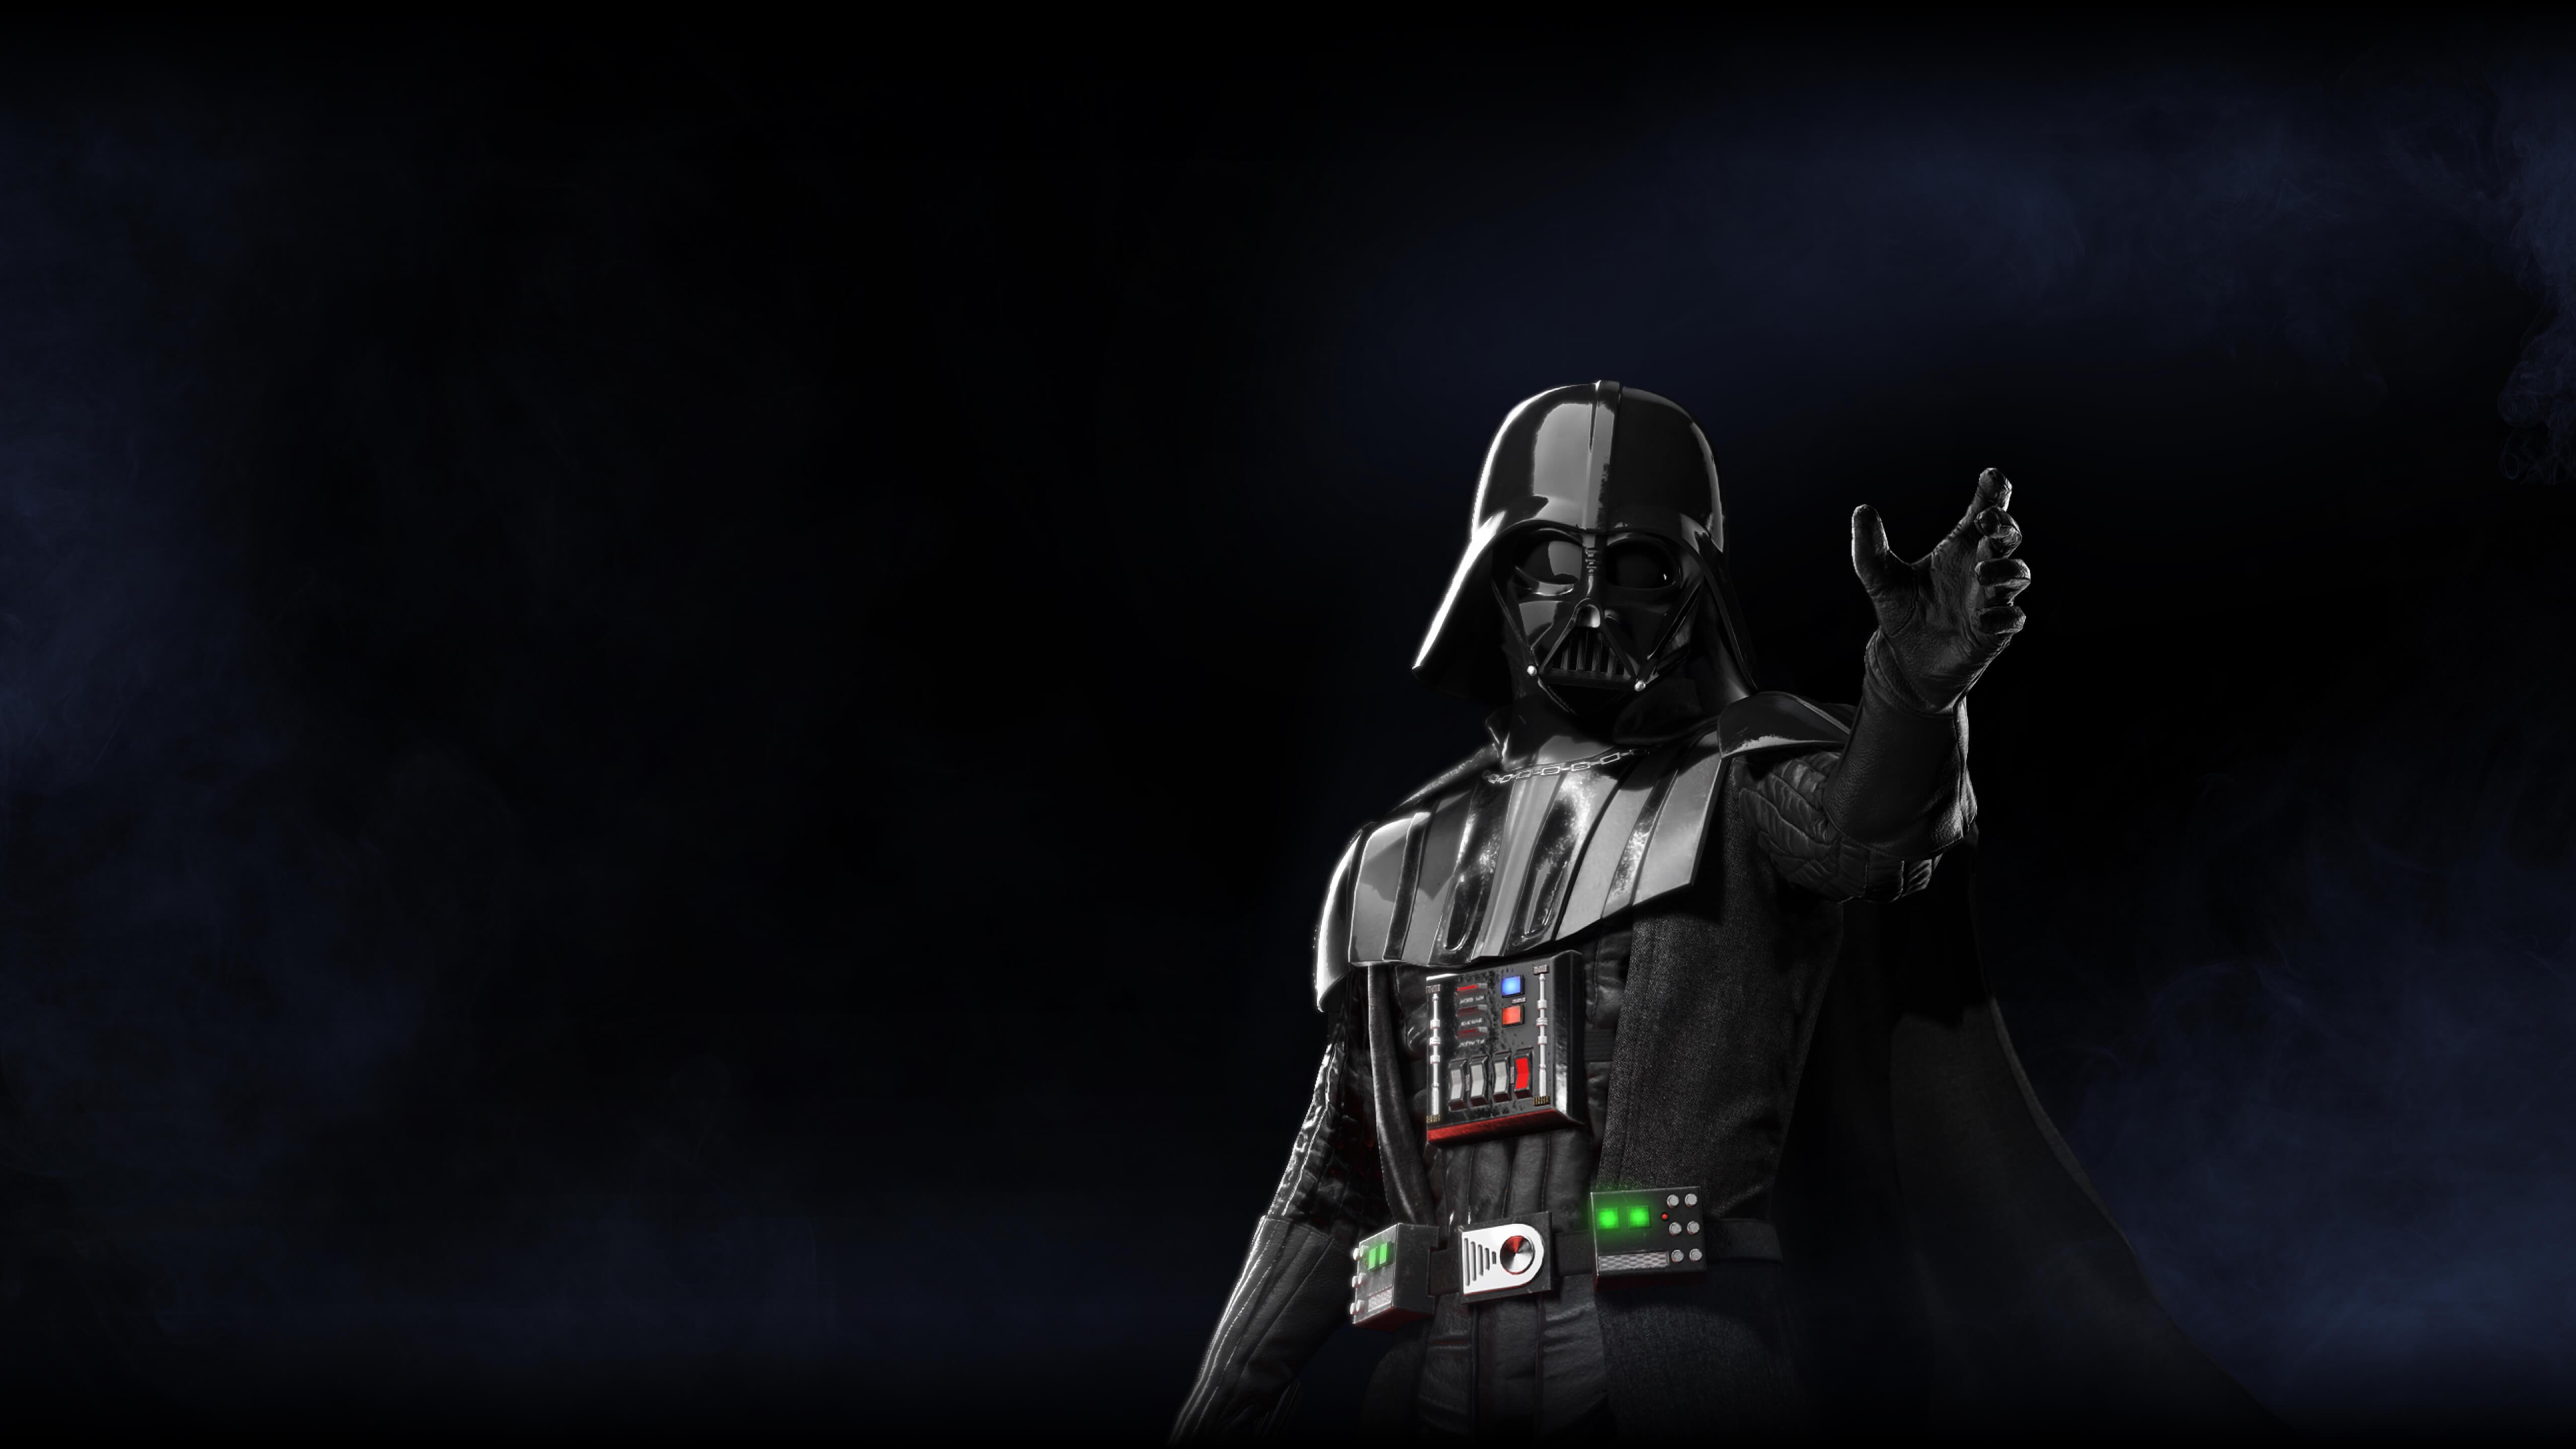 Darth Vader In Star Wars Battlefront Ii 5k Wallpapers Hd Wallpapers